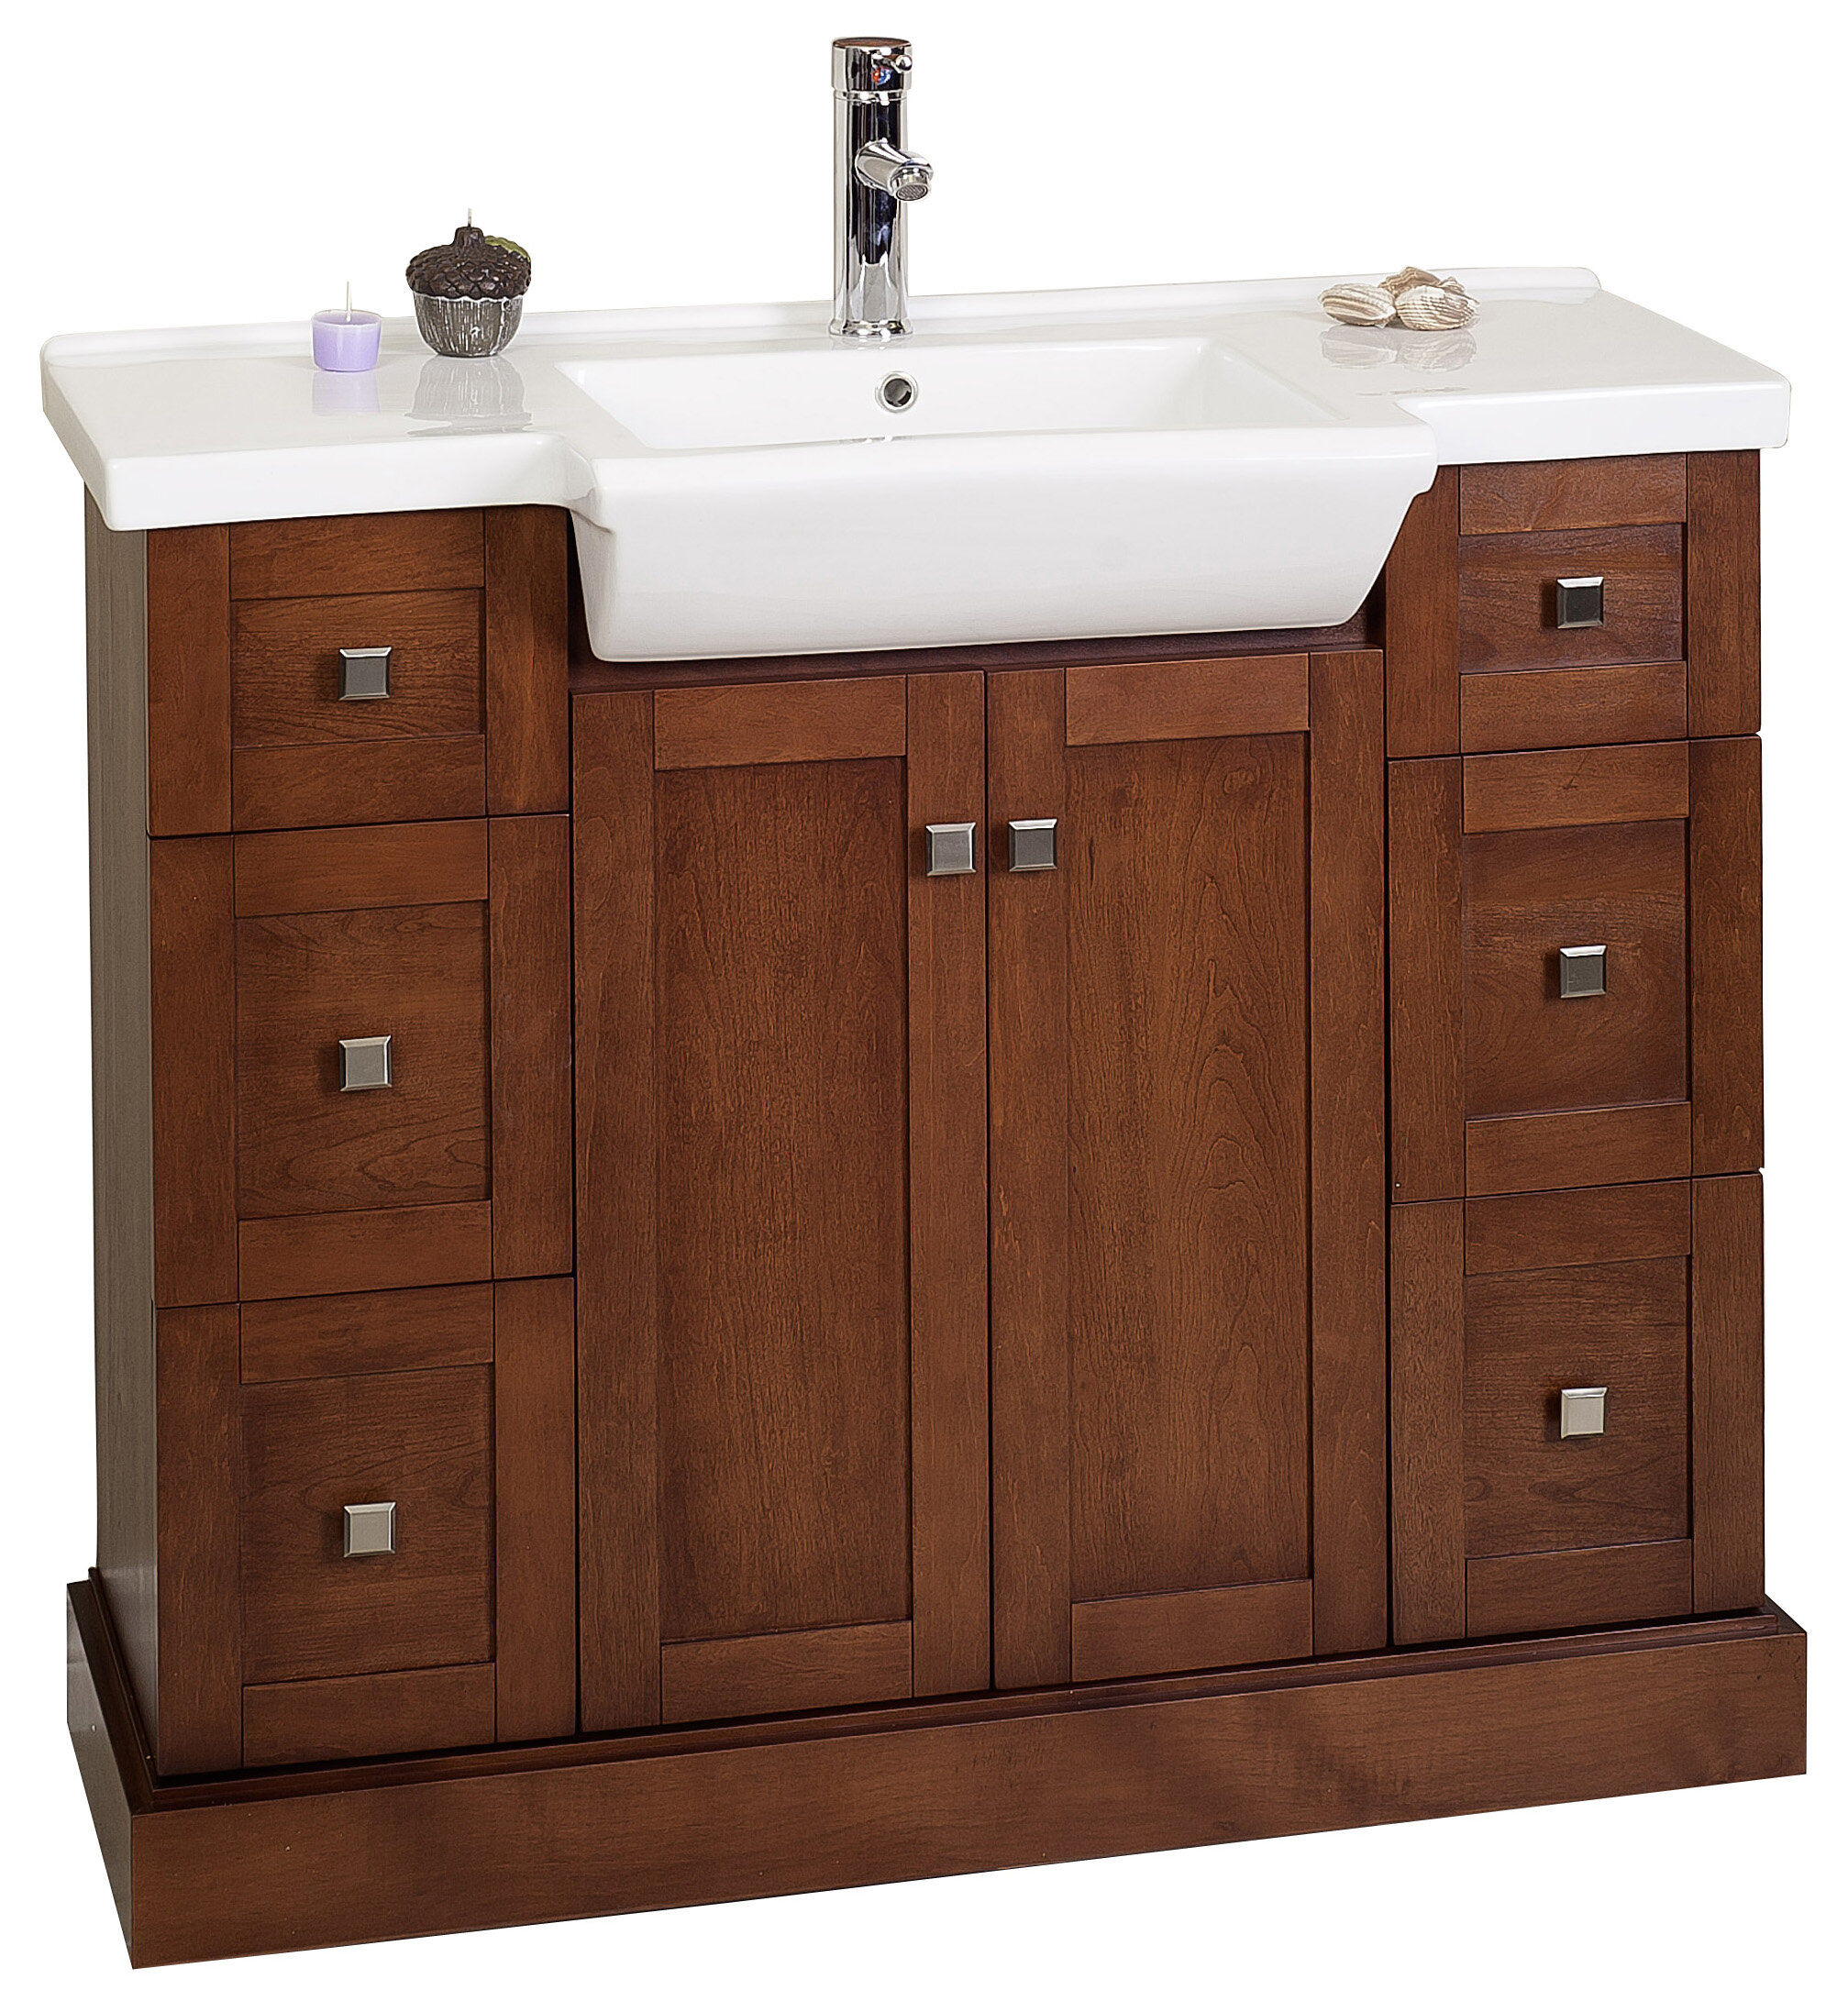 nook bathroom countertop yellow mirror sink vanity white ensemble